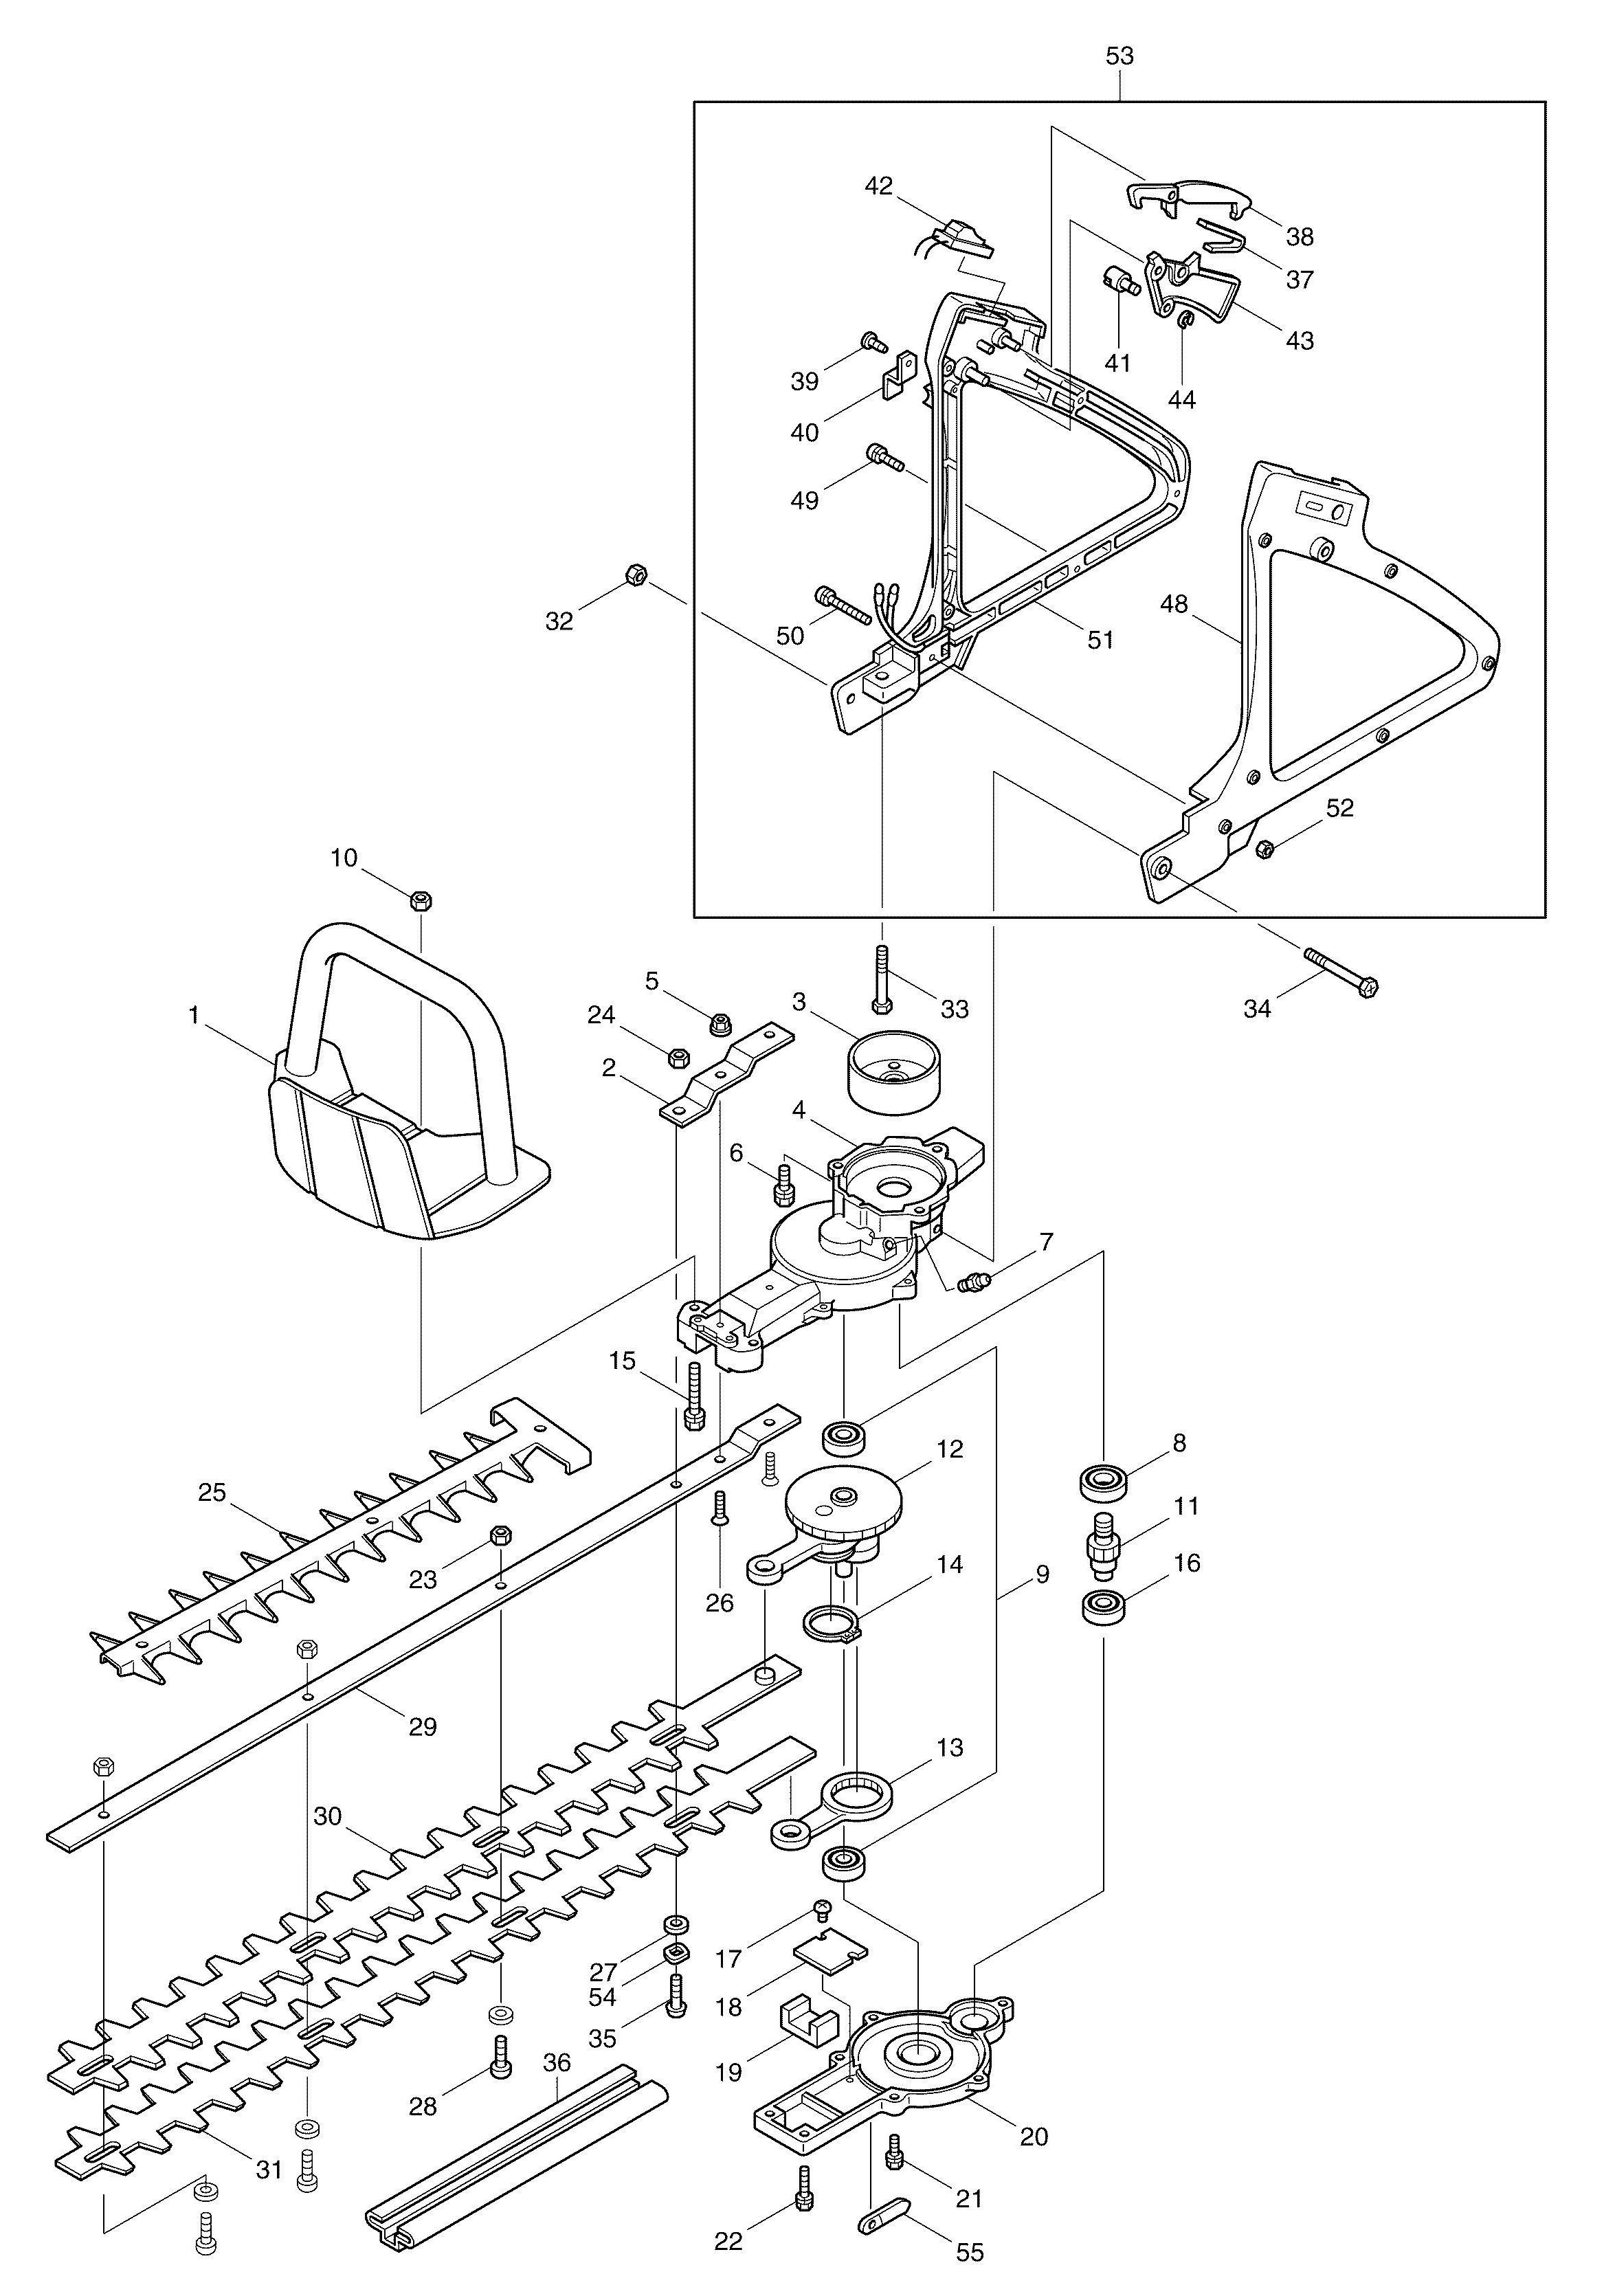 power tool handle design schematics power get free image about wiring diagram